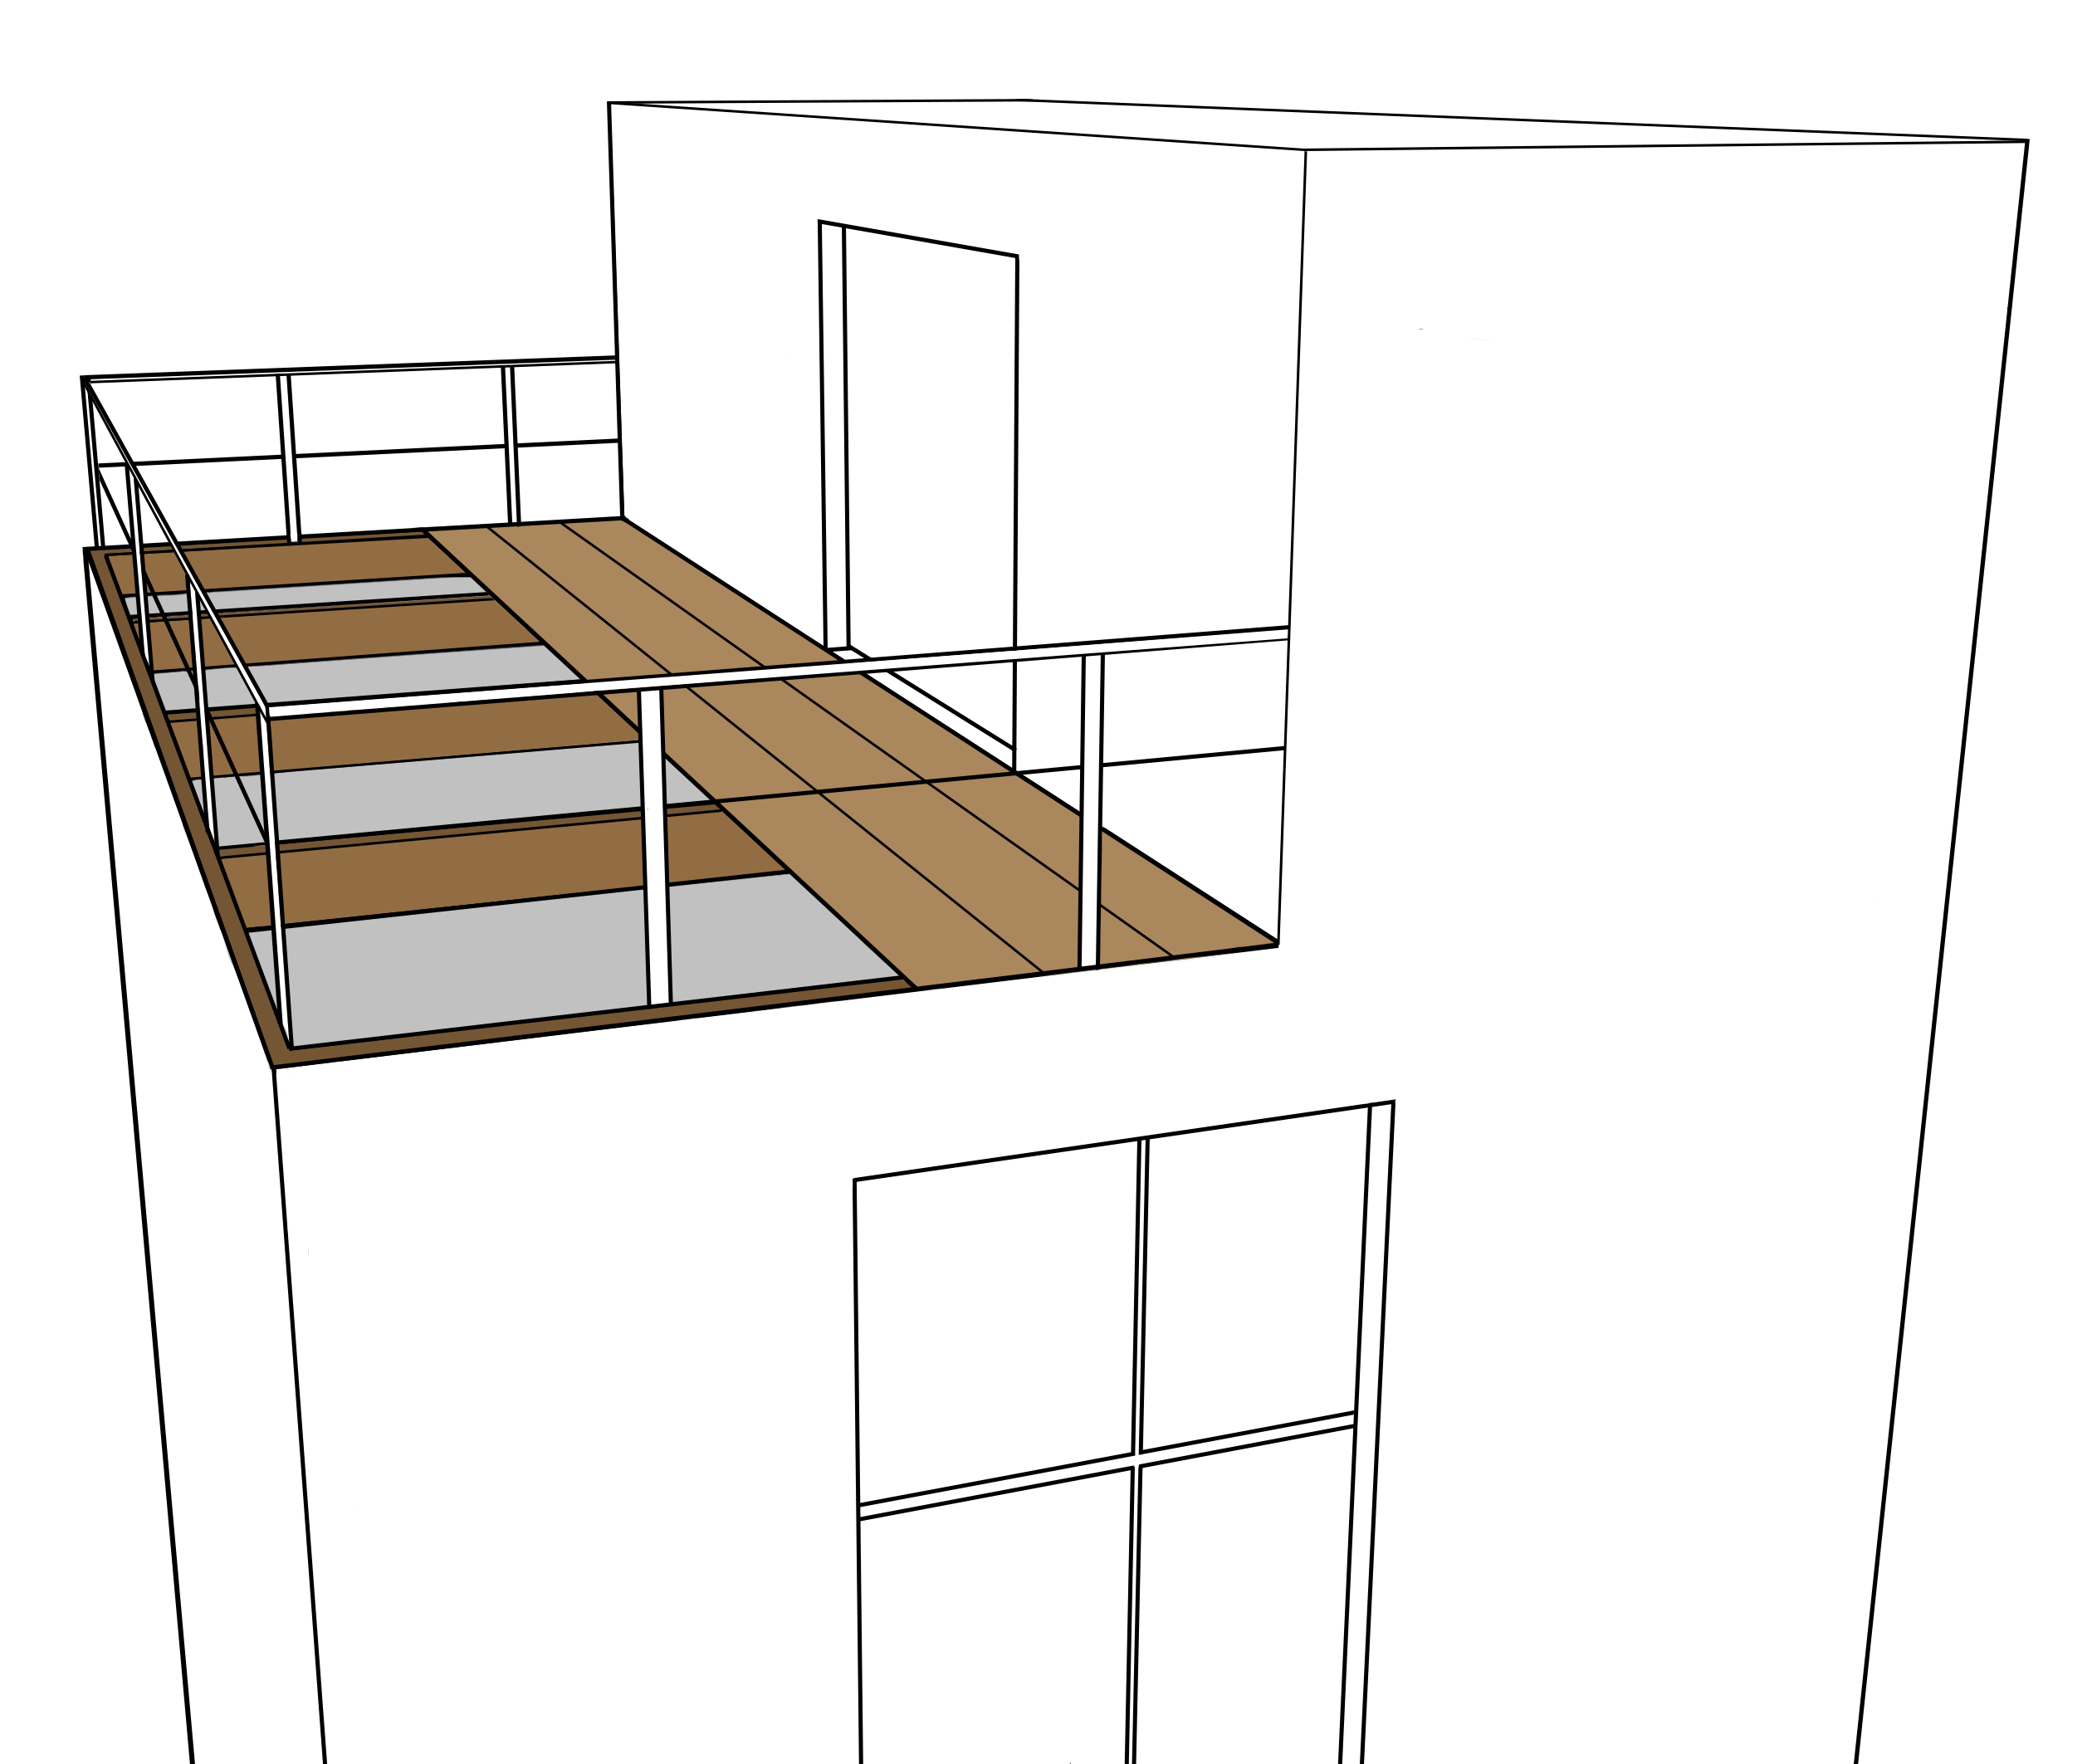 Monter une terrasse en bois sur pilotis Mailleraye jardin